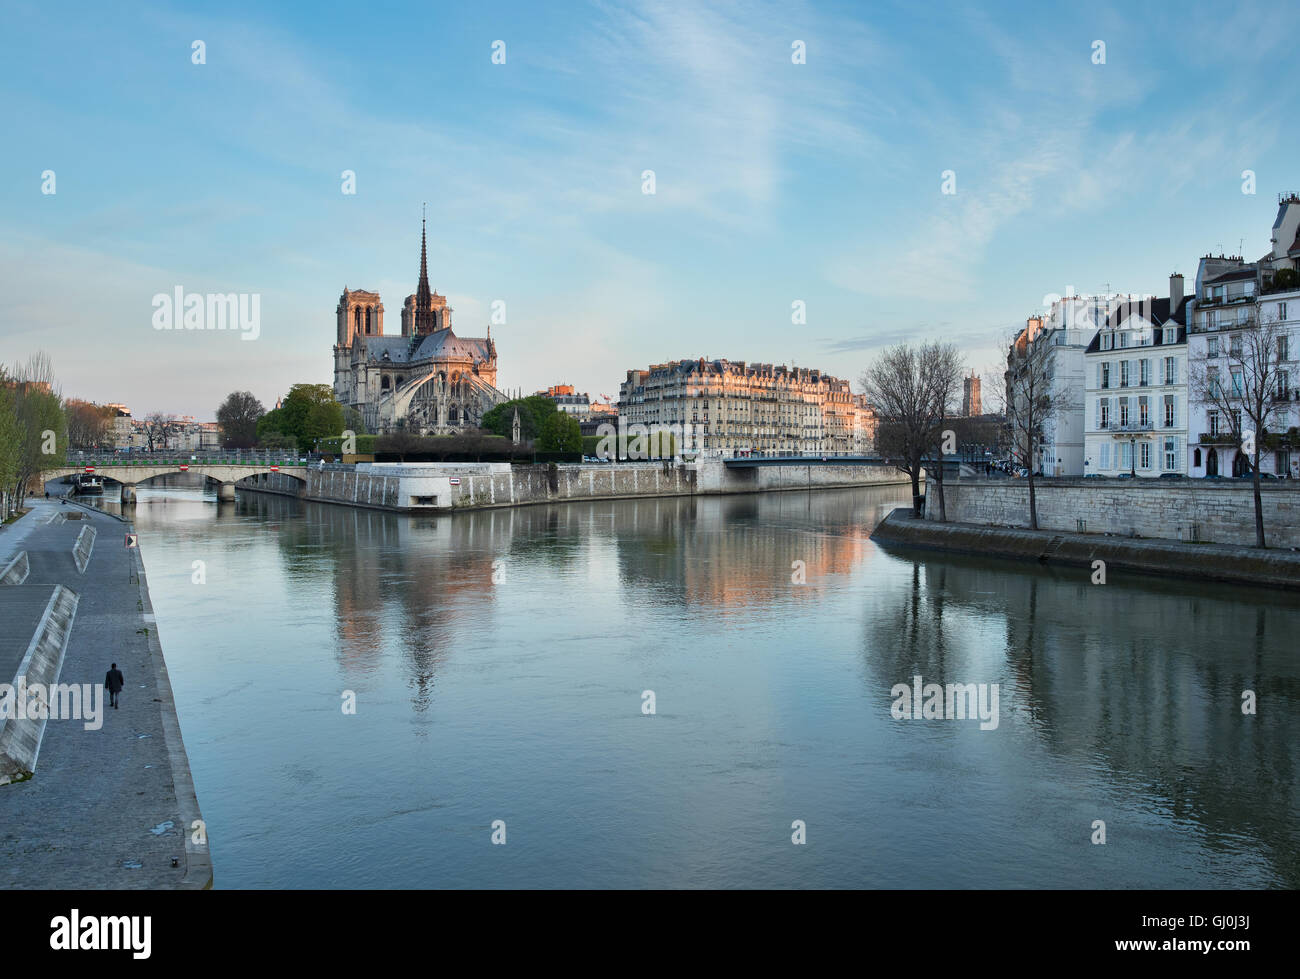 Dämmerung an der Cathedrale Notre-Dame und der Ile De La Cite bilden die Pont De La Tournelle über den Stockbild